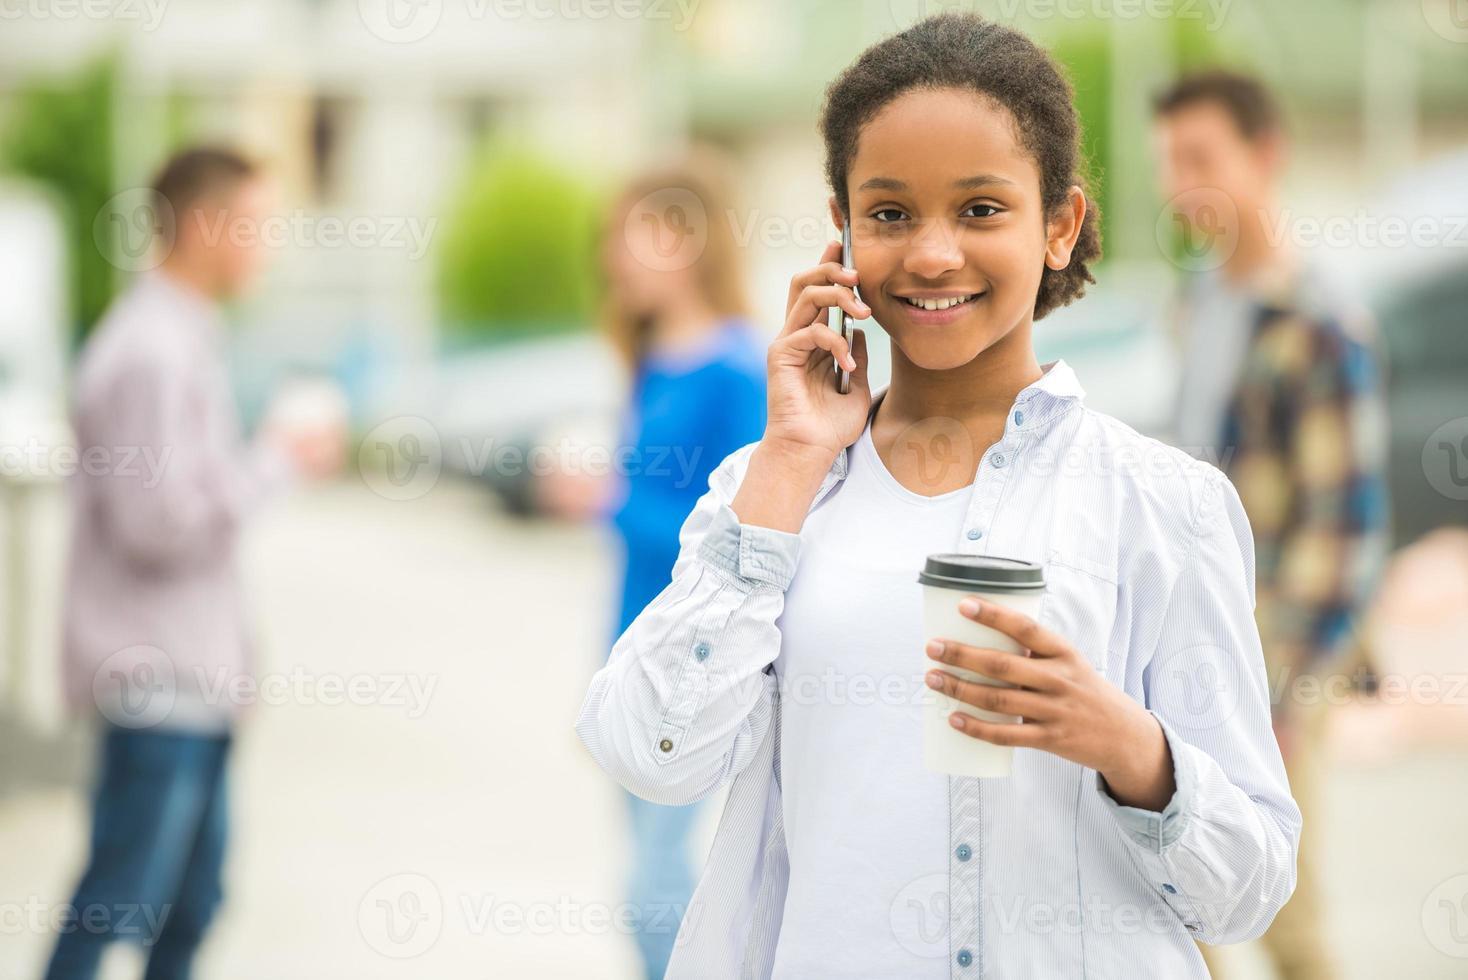 tonåringar foto